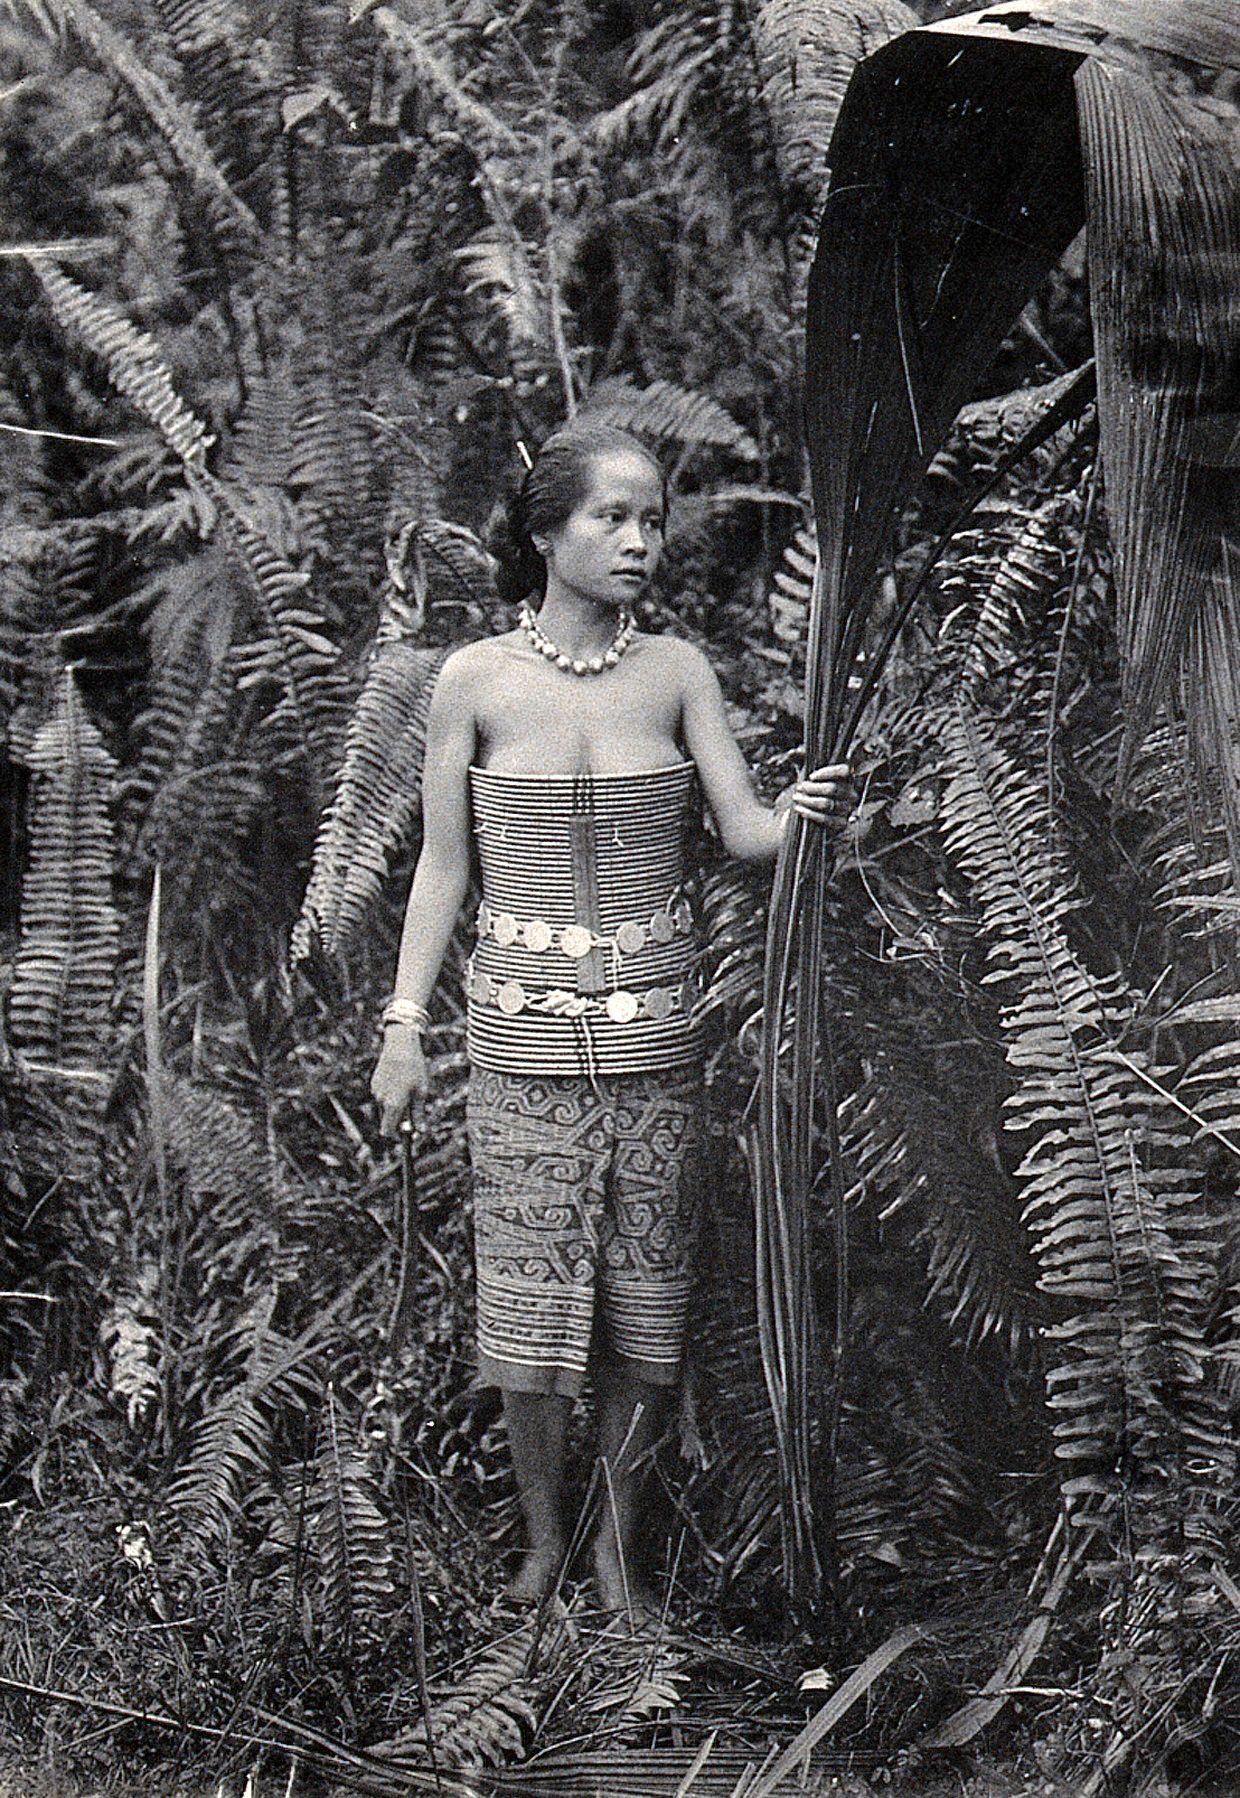 Sarawak girl